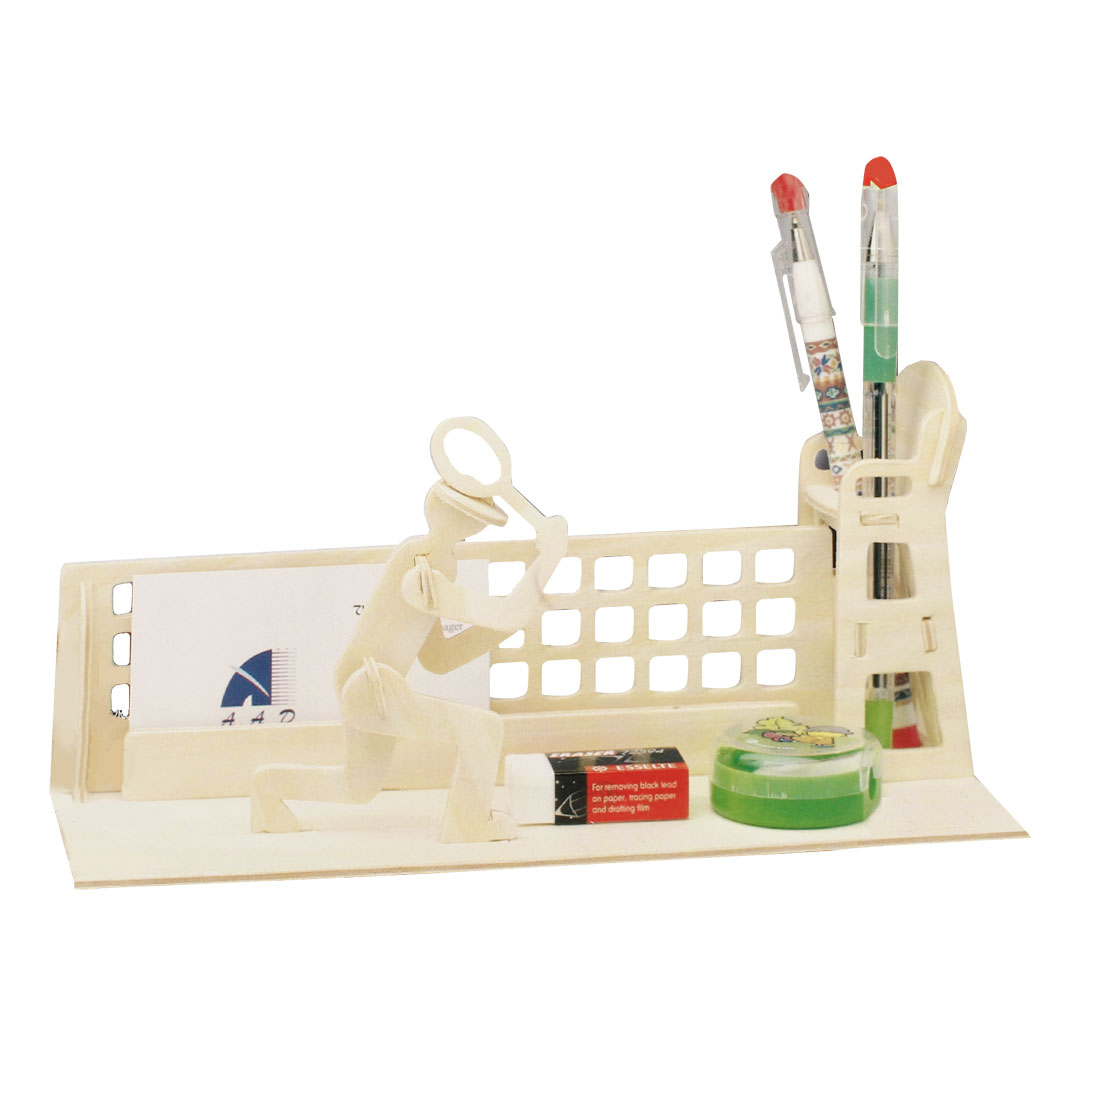 Children Woodcraft Construction 3D Tennis Pen Holder Container